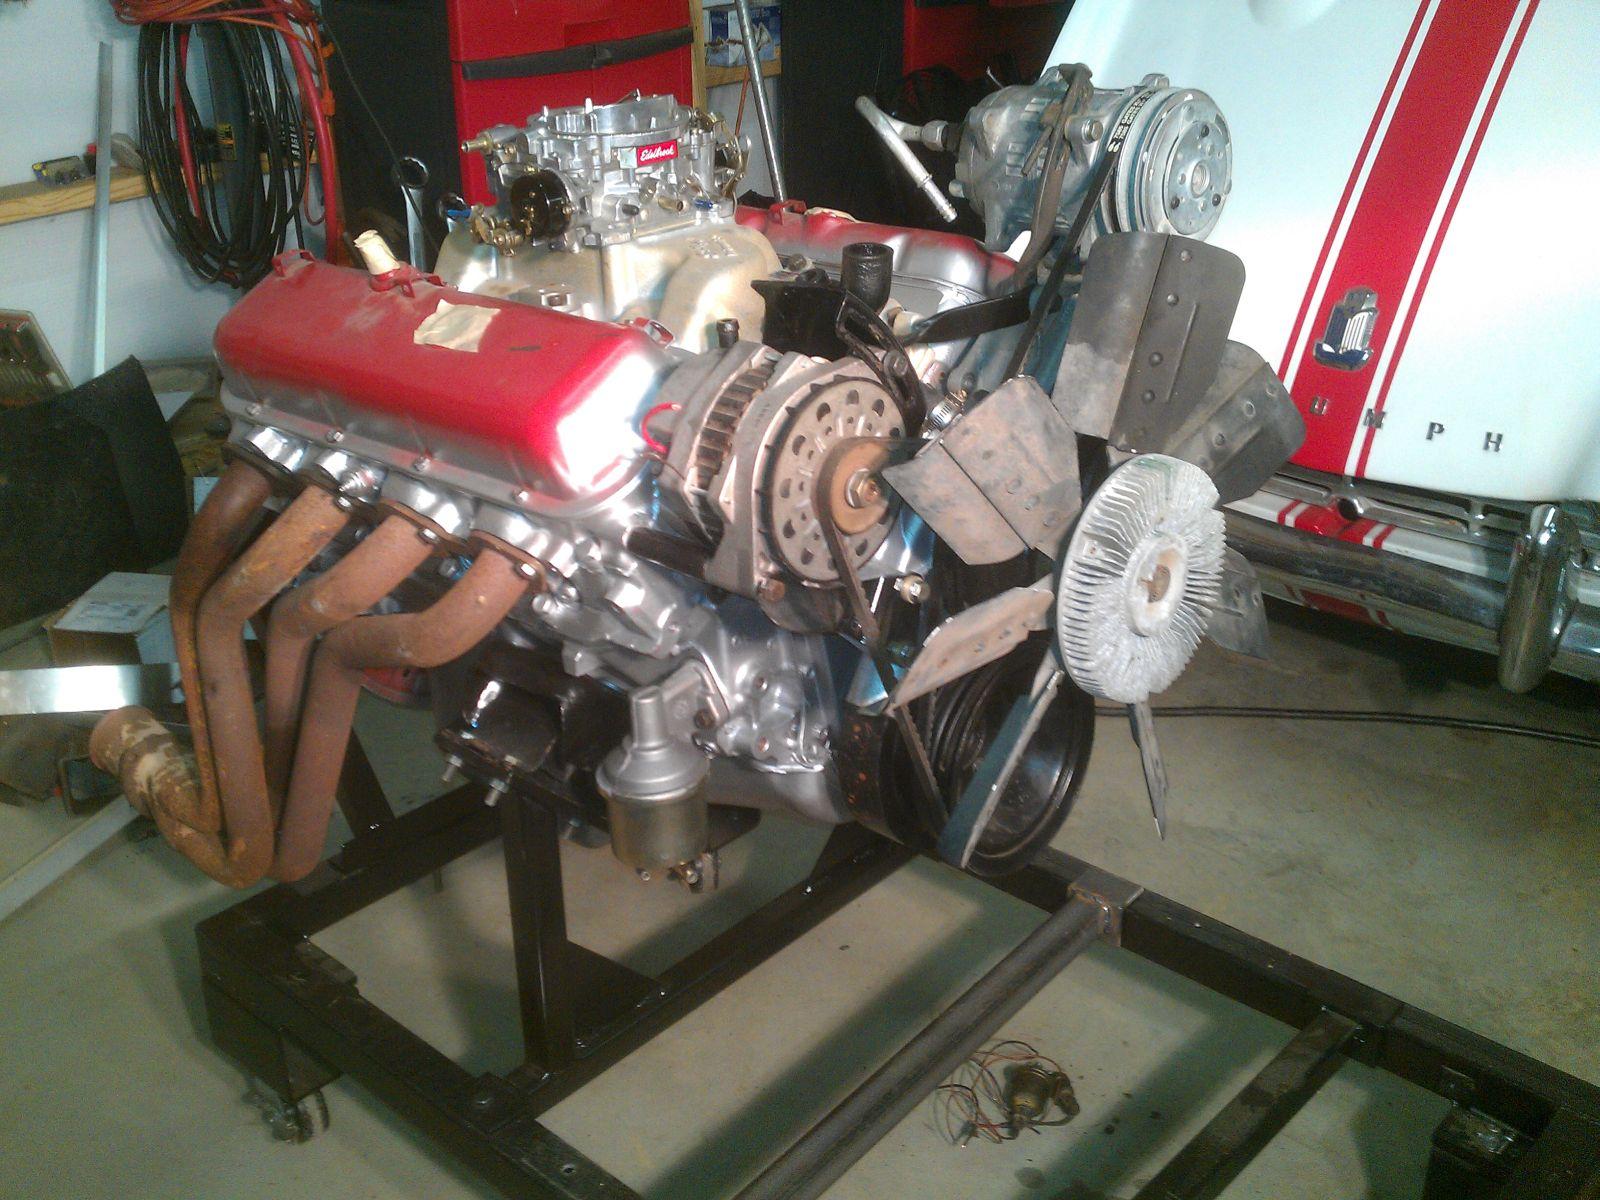 Click image for larger version  Name:74-argosy-engine-side-ac-alt.jpg Views:92 Size:329.9 KB ID:178178